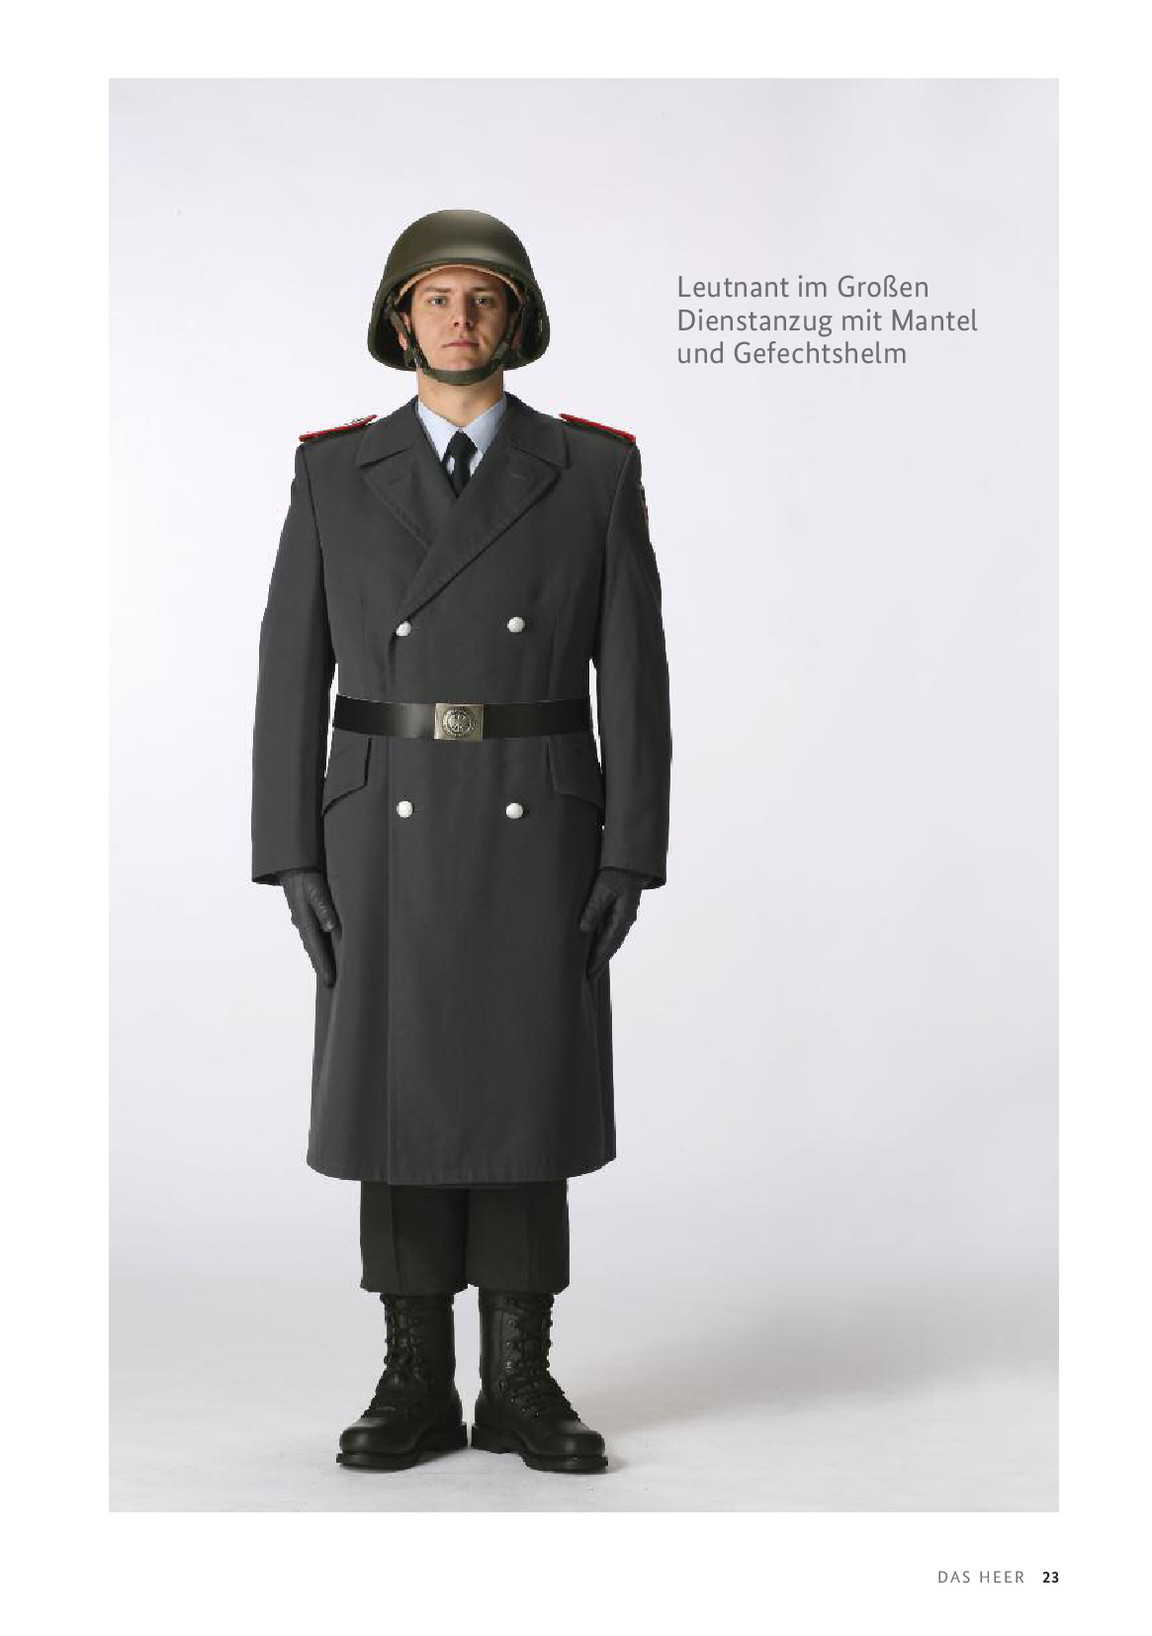 Mantel bundeswehr heer